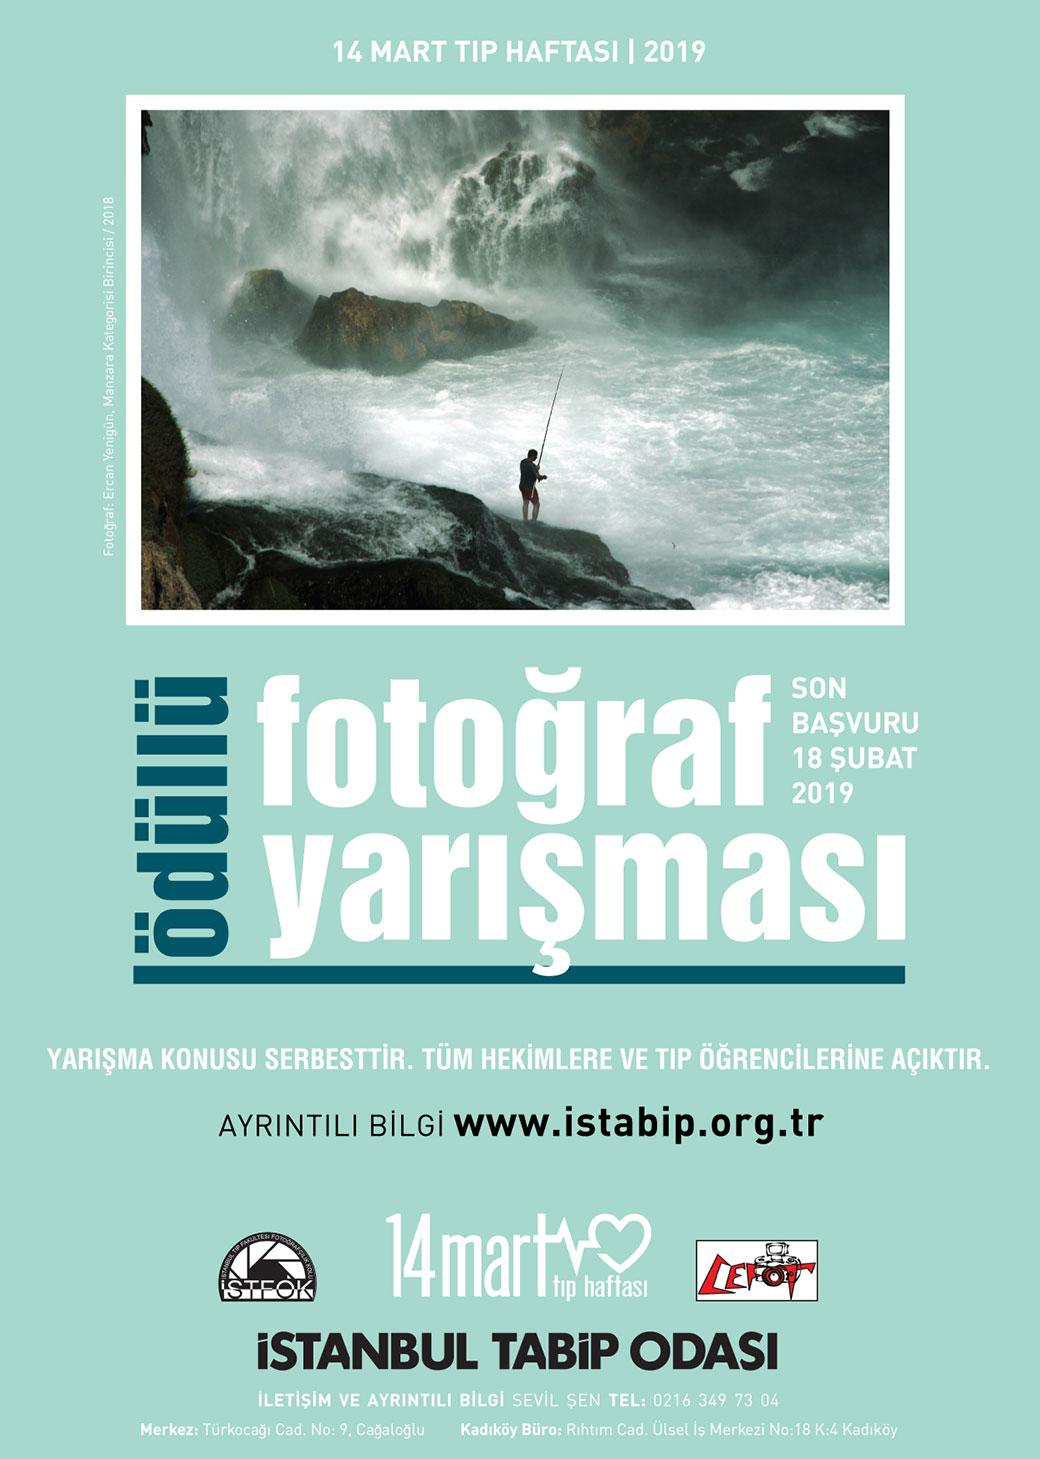 https://www.istabip.org.tr/14mart/2019/fotograf-yarismasi